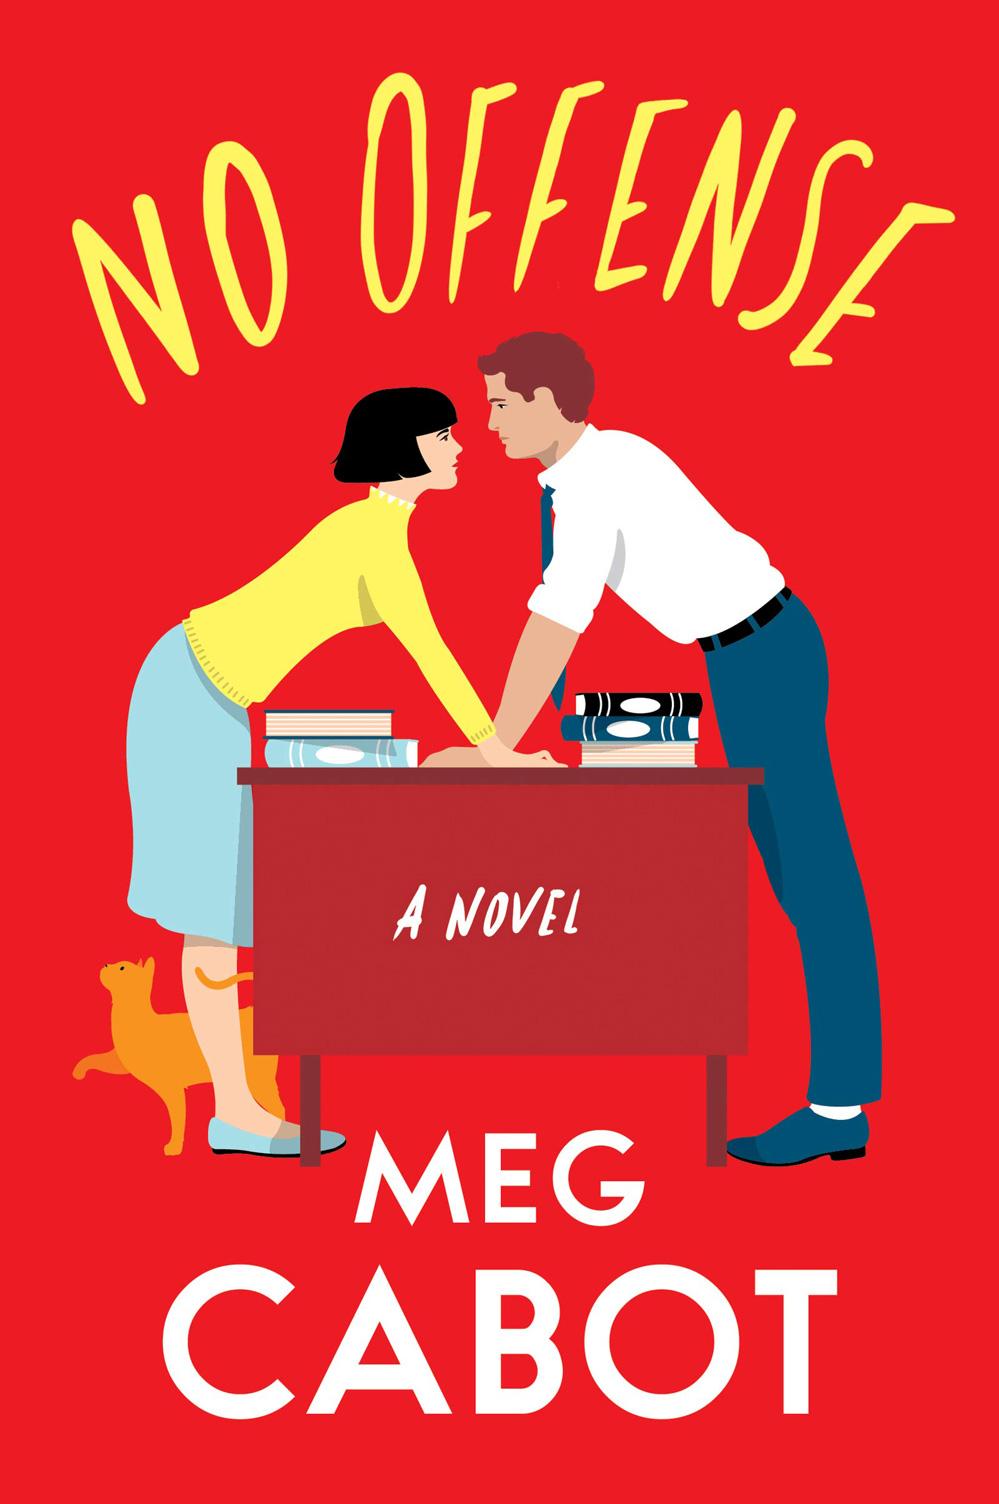 No Offense by Meg Cabot